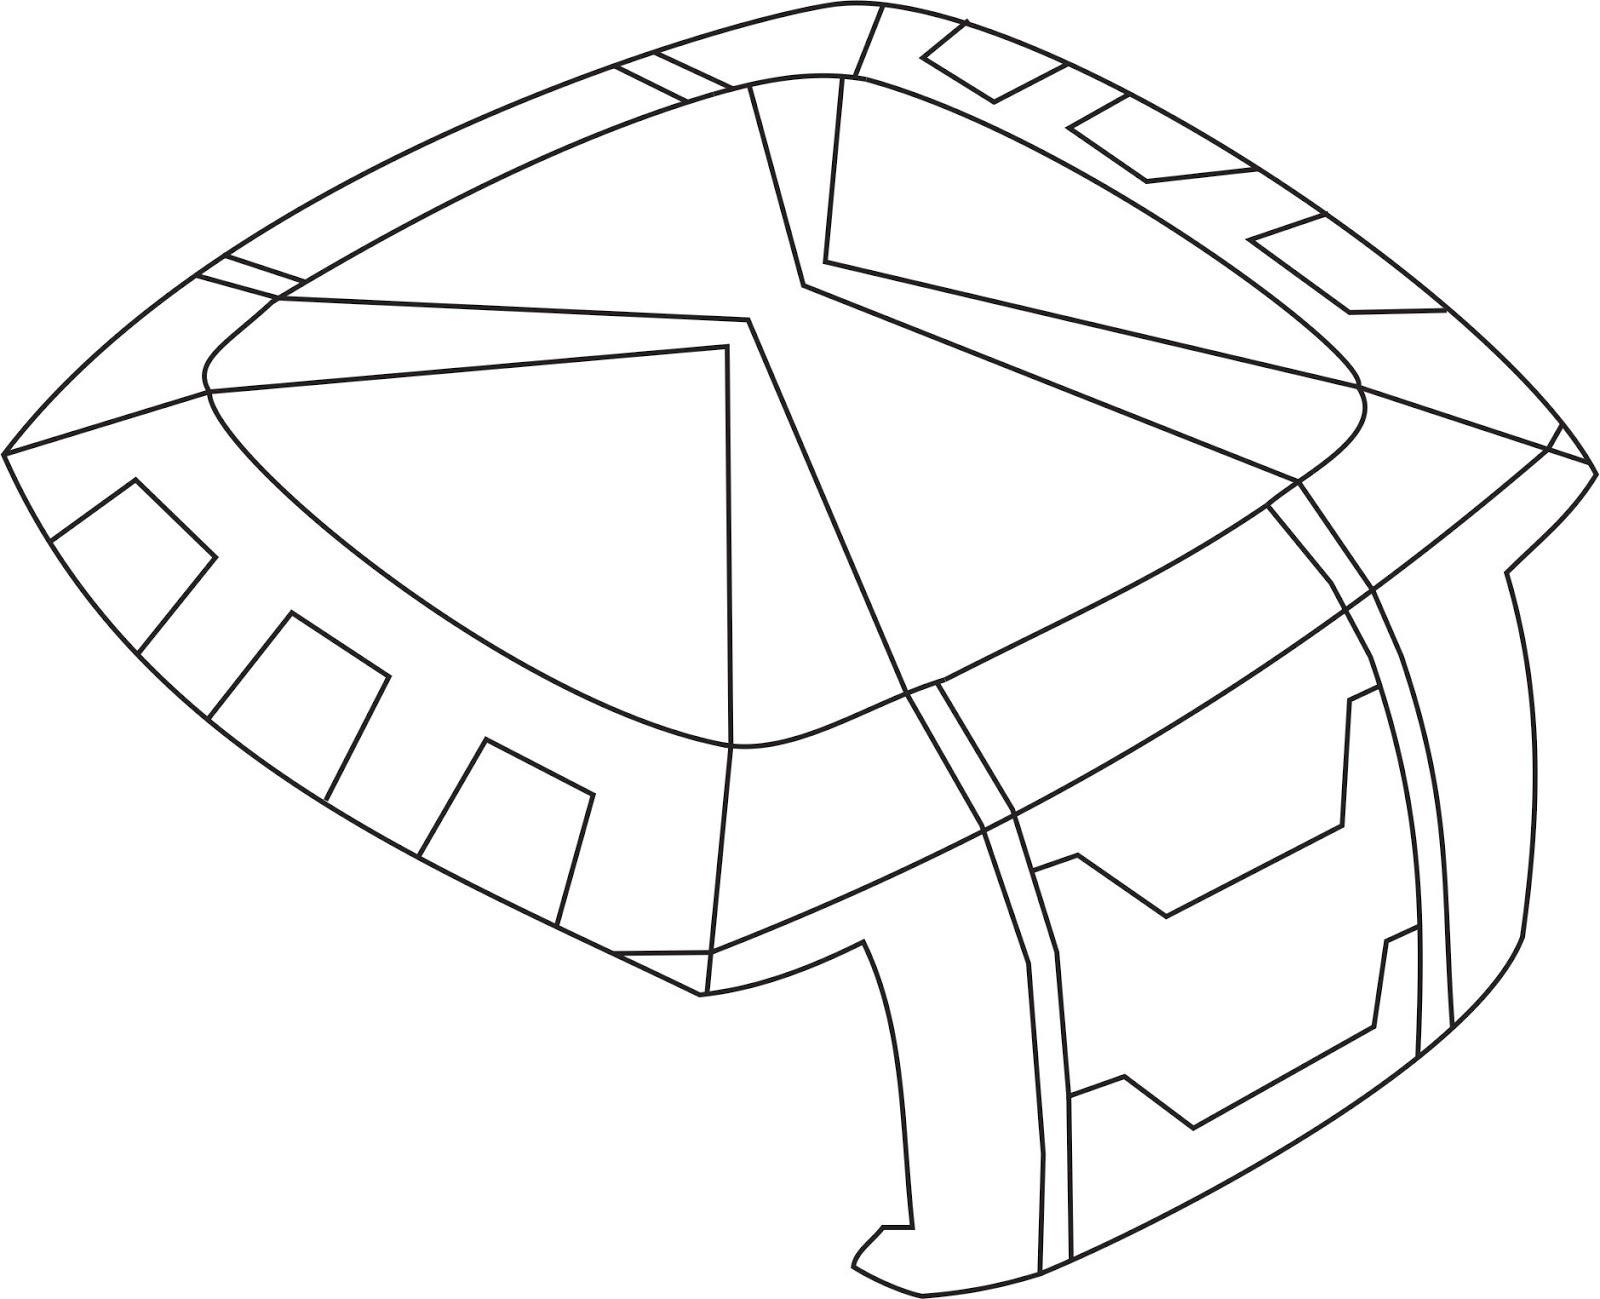 Ben 10 Omniverse Omnitrix Coloring Pages Sketch Coloring Page